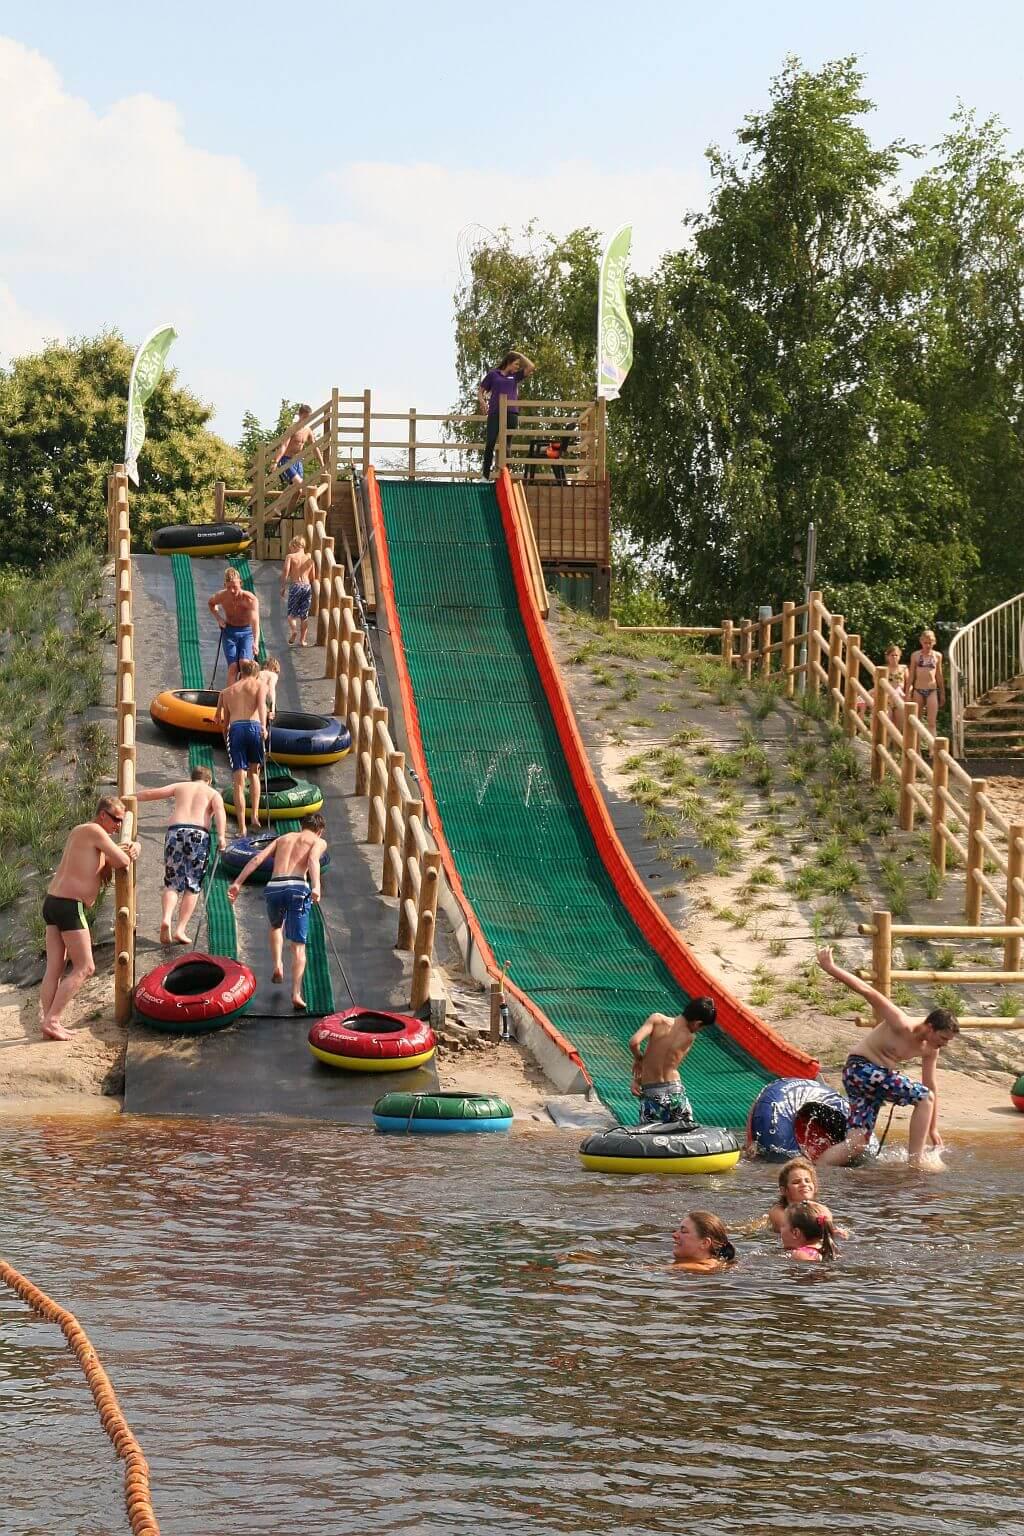 5 Sterne Familiencampingplätz in Hardenberg Overijssel - Familiencampingplätz in Holland